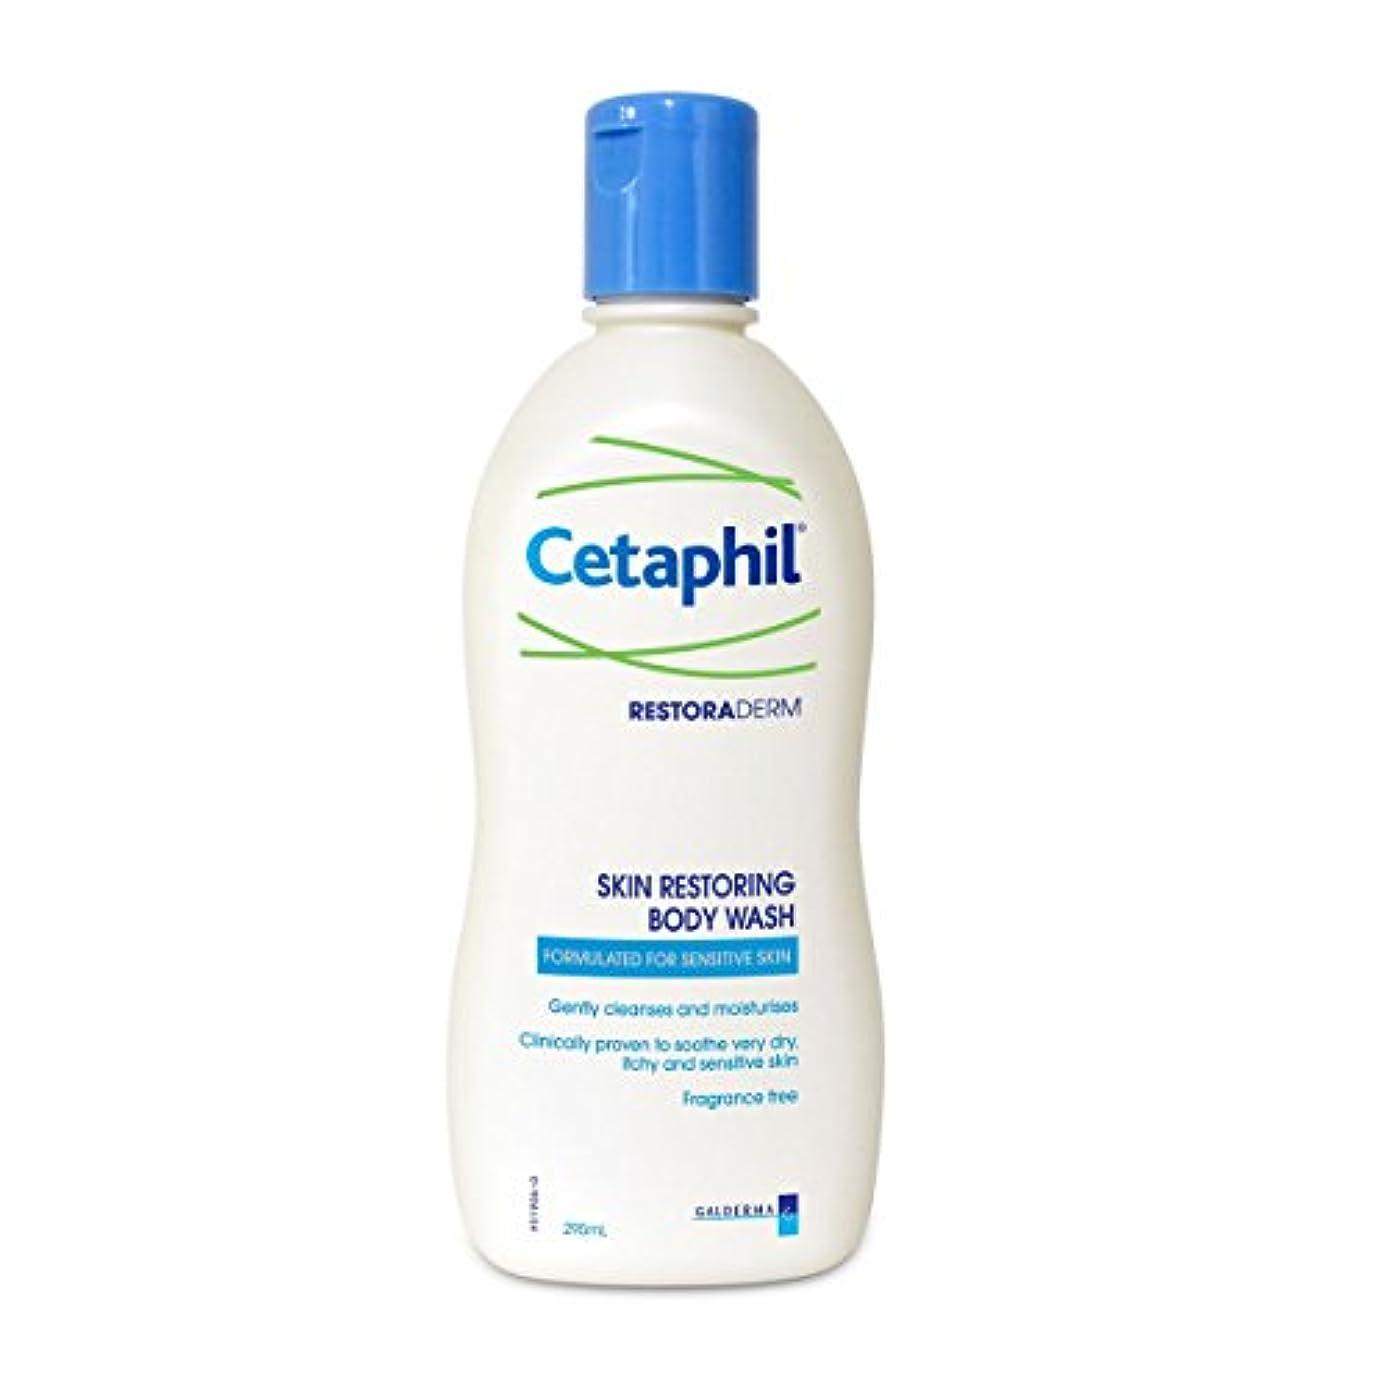 Cetaphil Restoraderm Liquid Soap 295ml [並行輸入品]